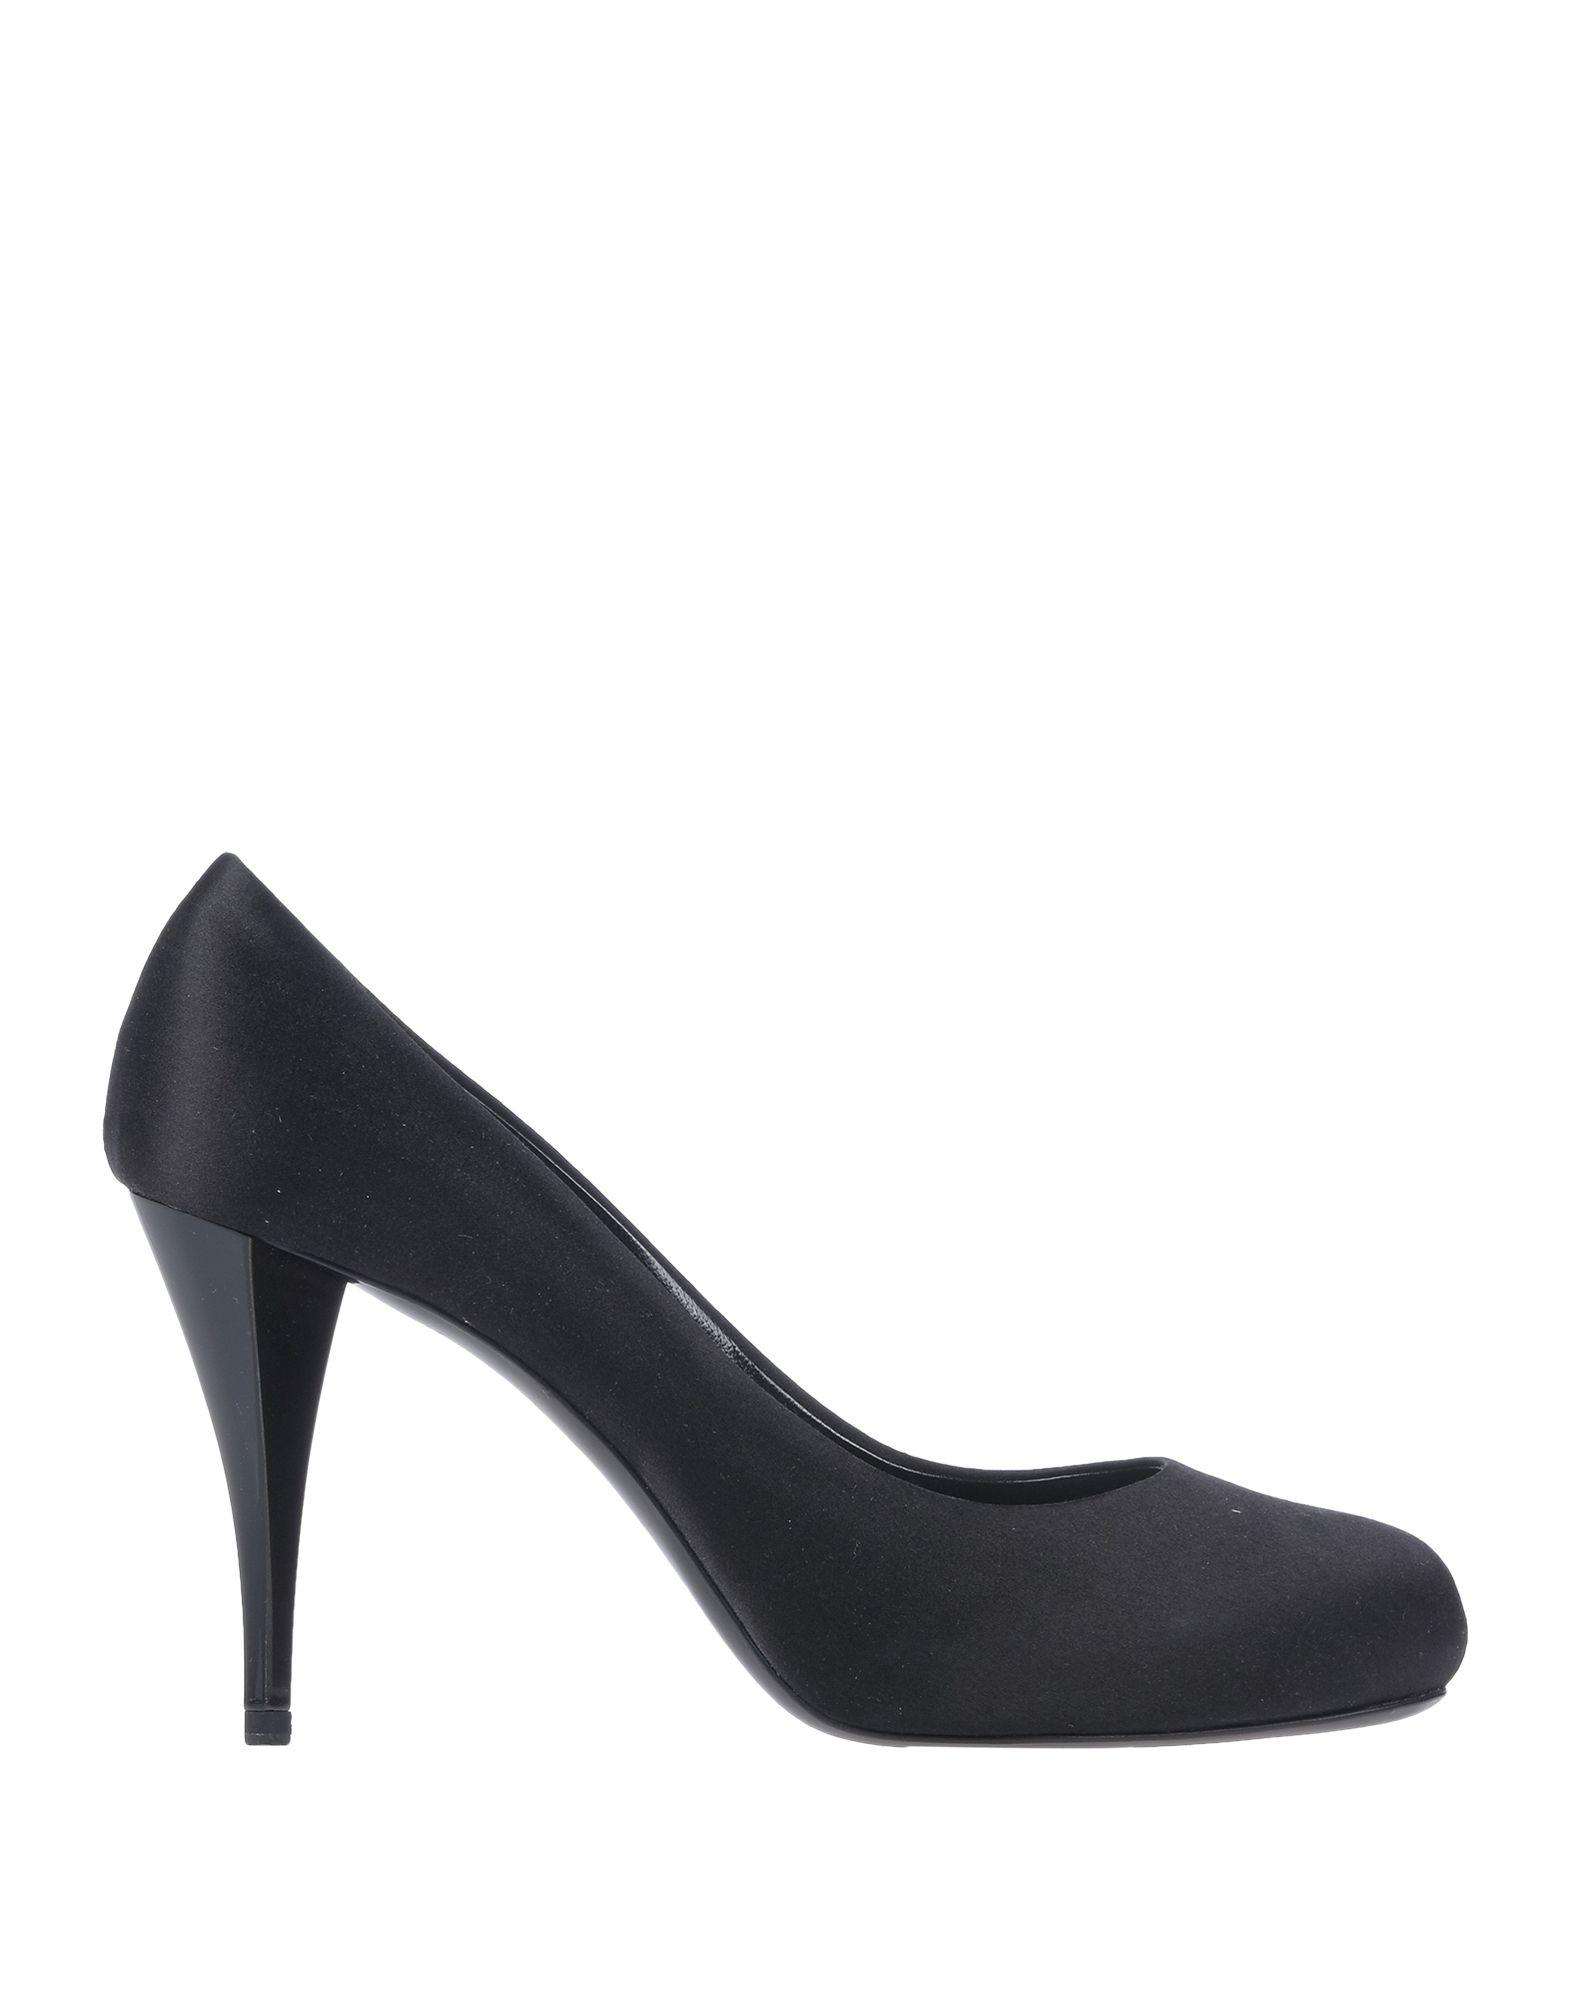 Фото - PIERRE HARDY Туфли pierre hardy обувь на шнурках